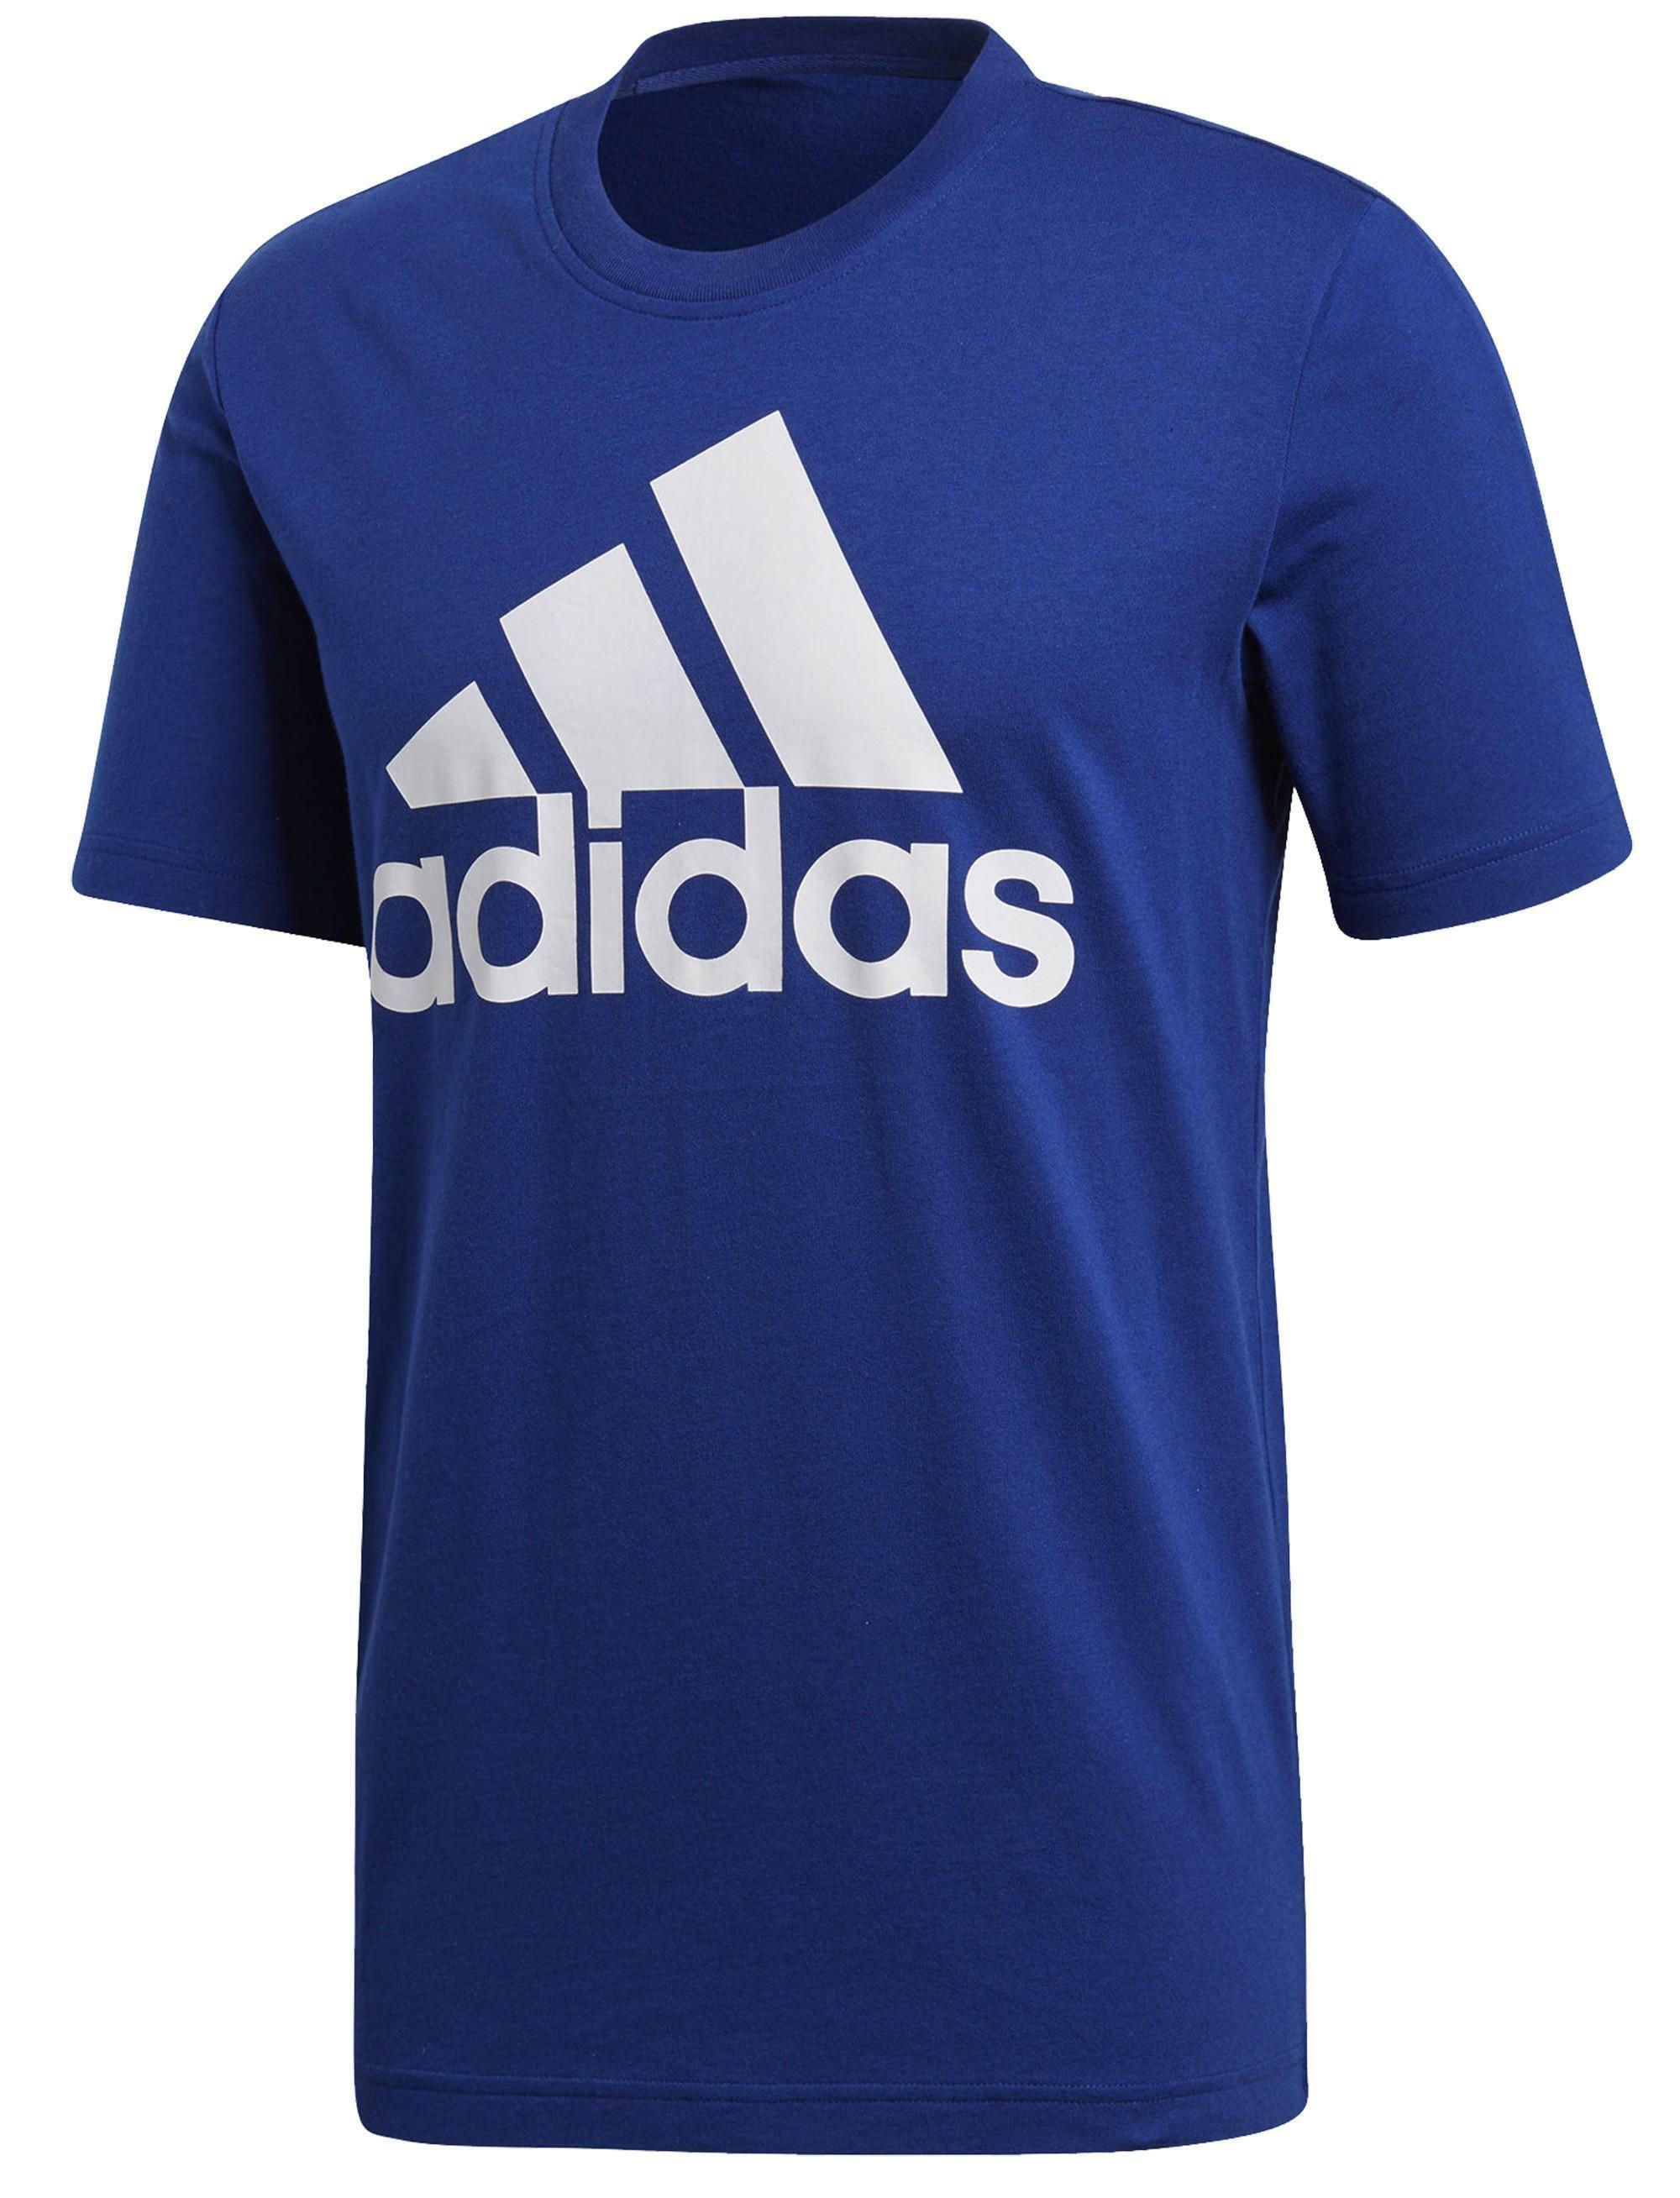 adidas adidas ess linear t-shirt uomo blu cz7510